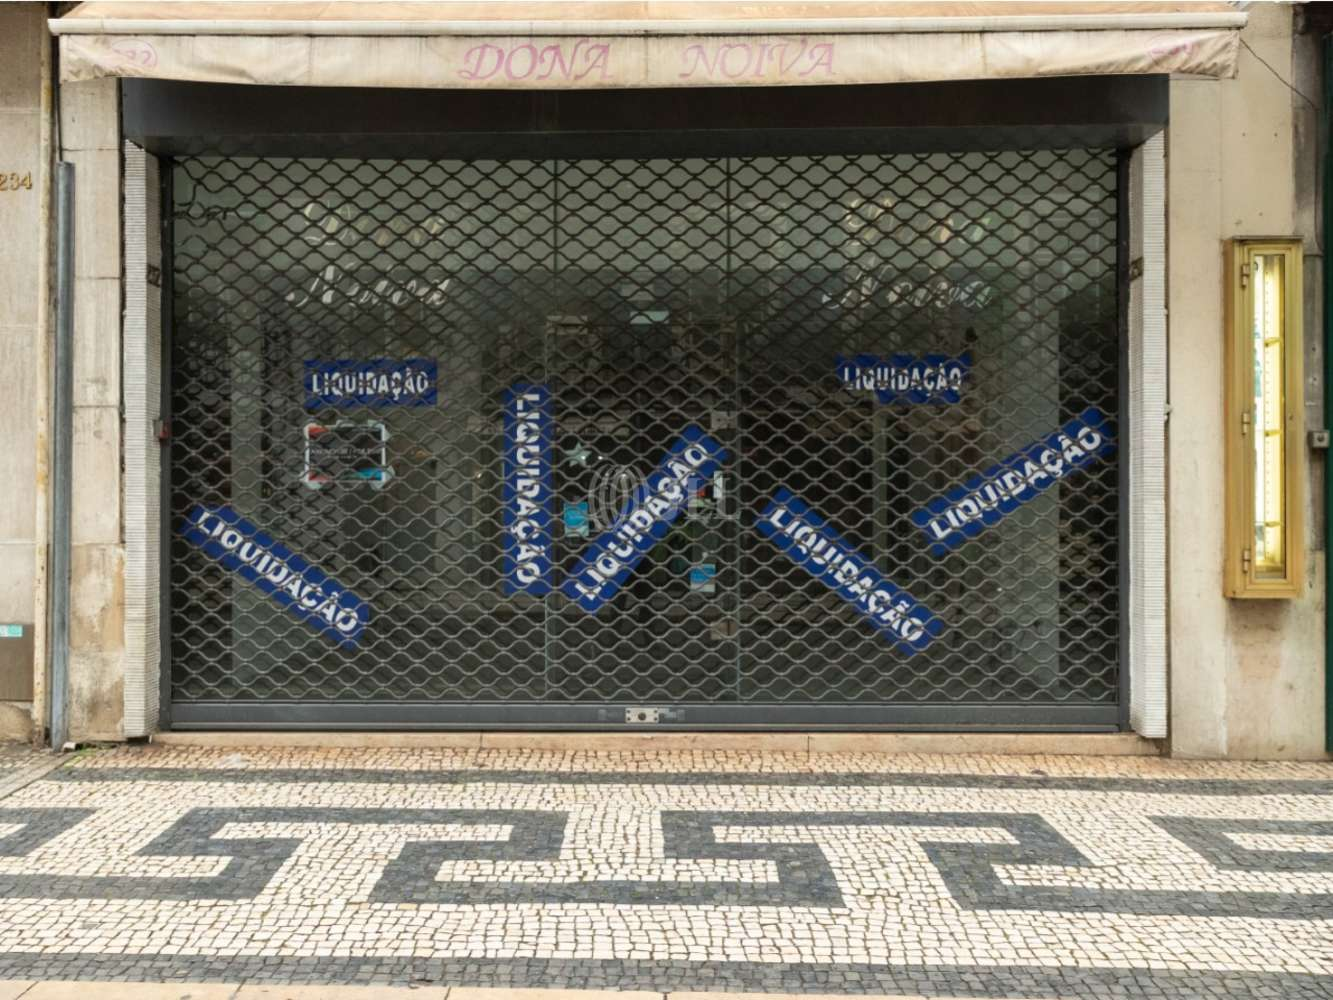 Loja Lisboa, 1100-422 - Prata 232